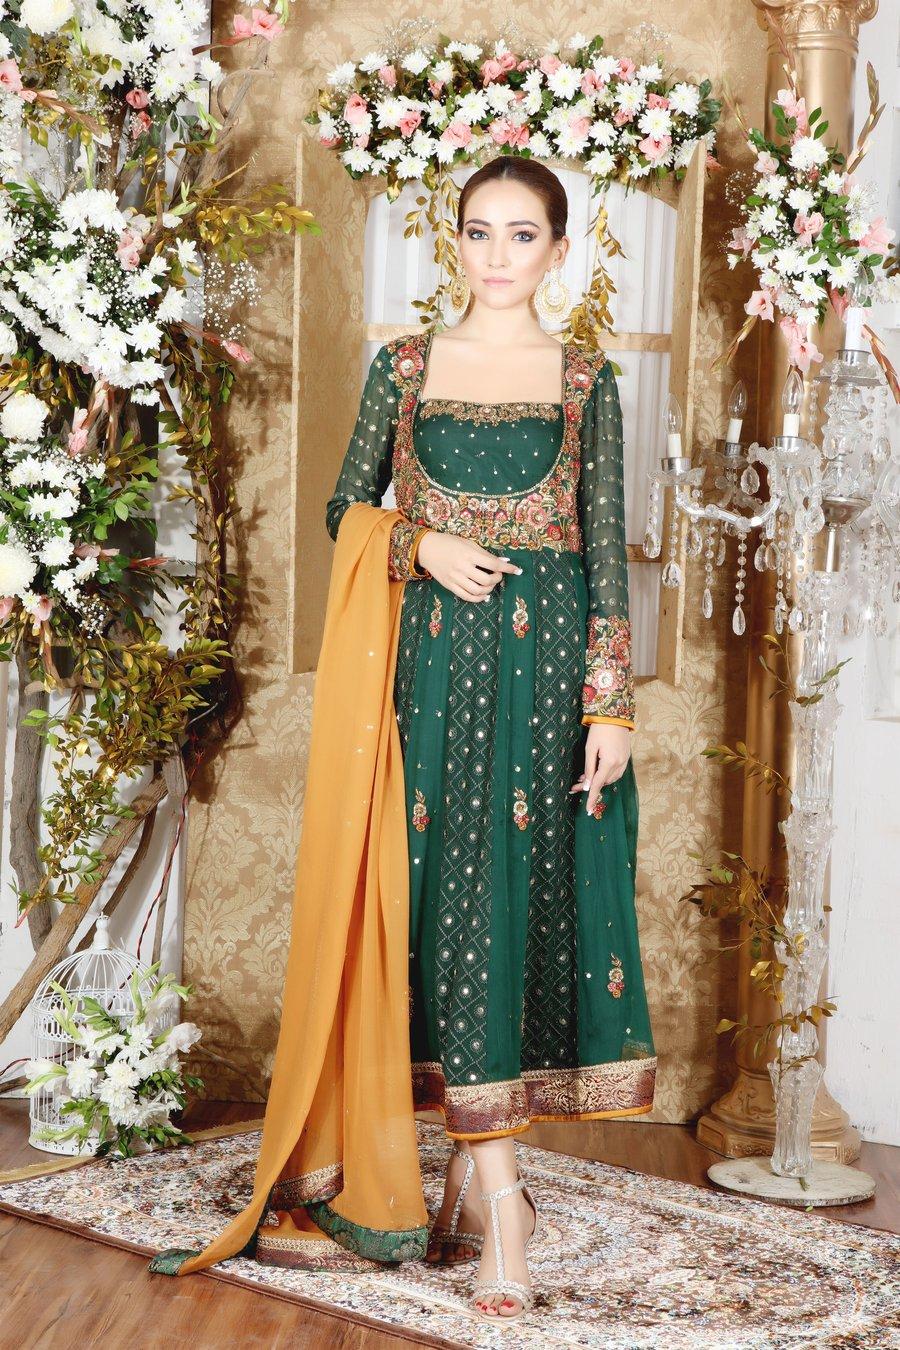 Pure Chiffon Peshwas with multi color Resham work by Sarosh Salman Mehndi Dress with Jamawar Pant and Mustard Chiffon Dupatta